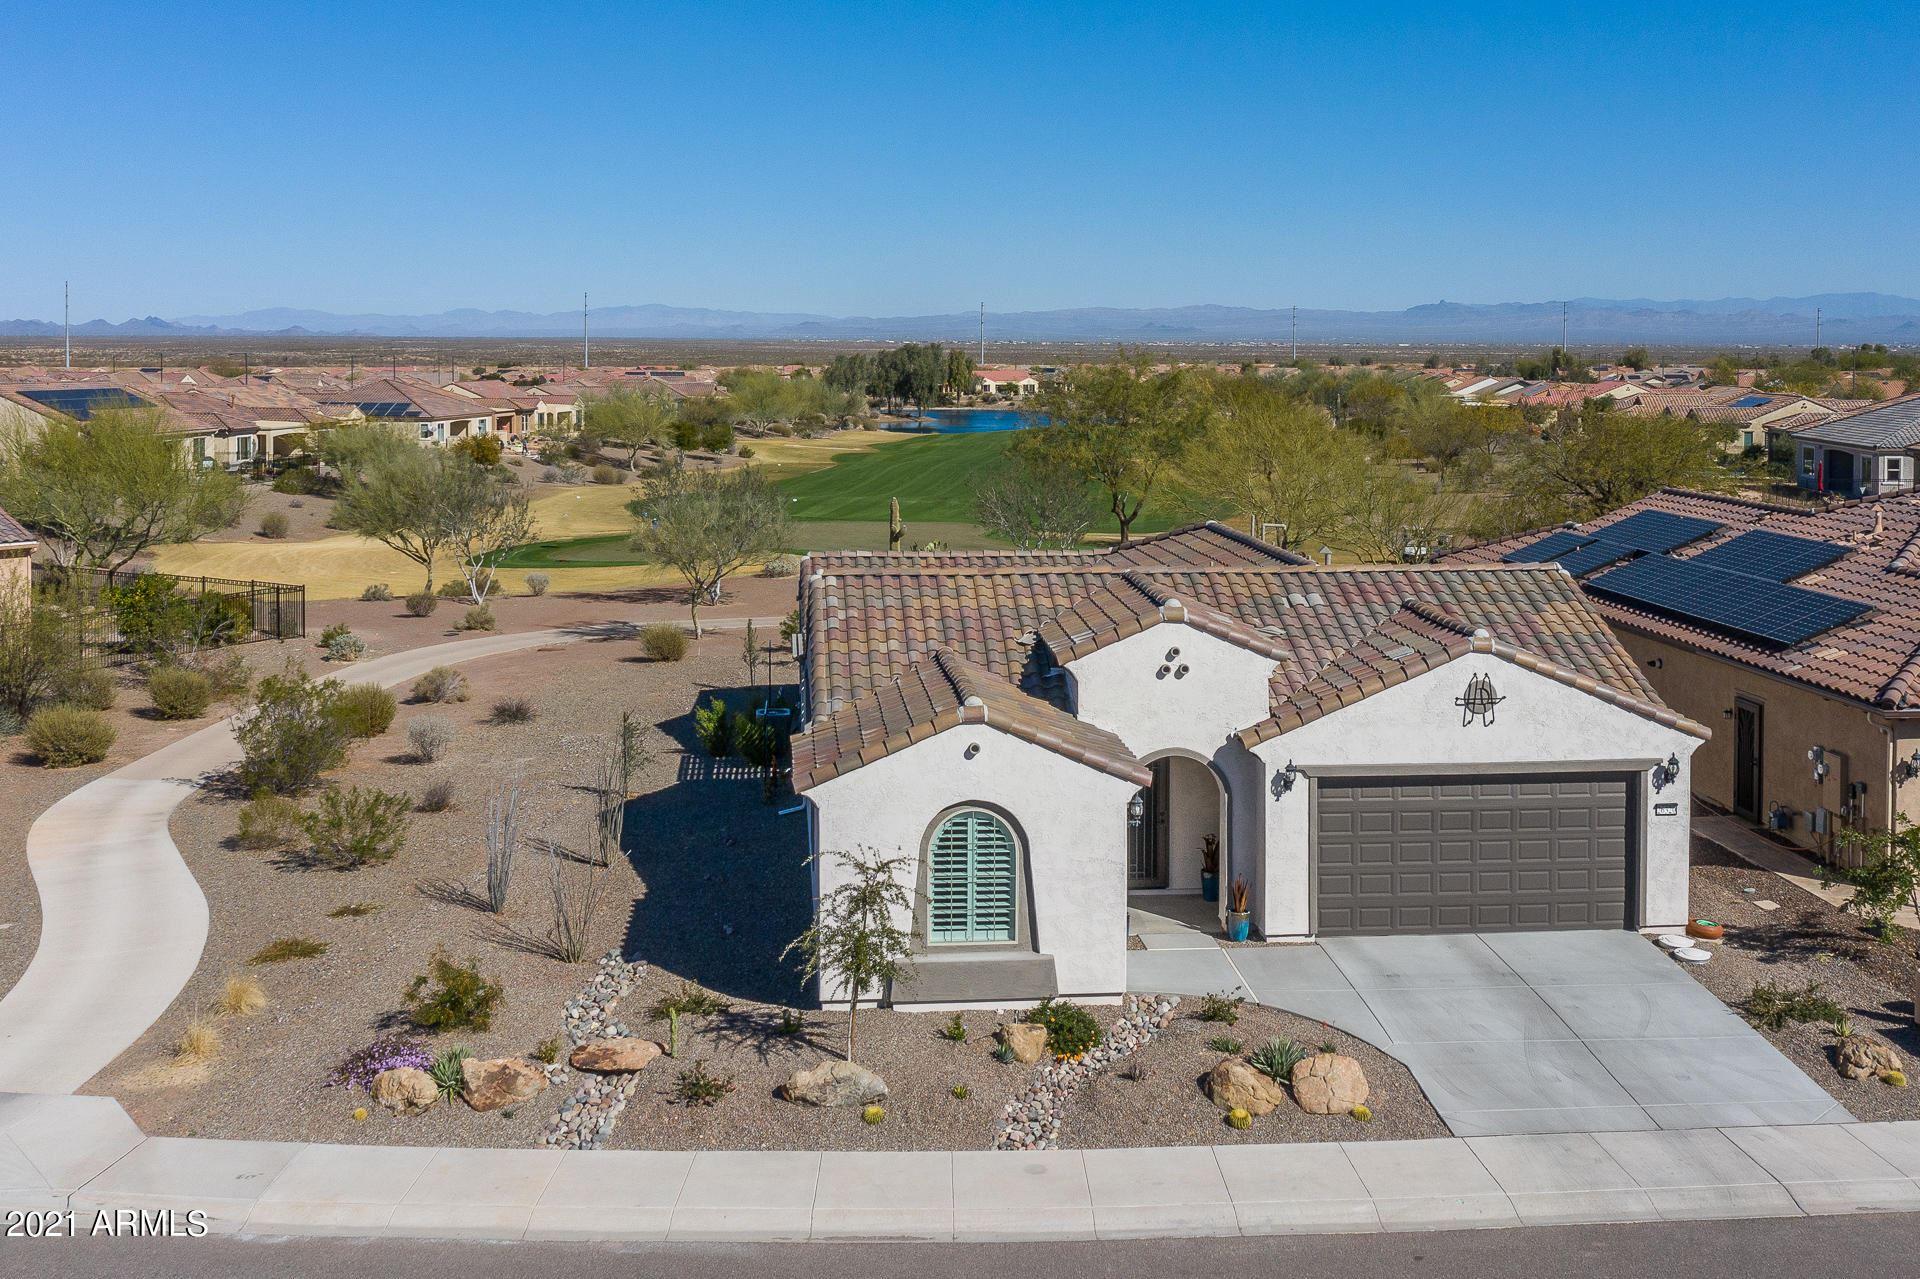 Photo of 26320 W MATTHEW Drive, Buckeye, AZ 85396 (MLS # 6200018)